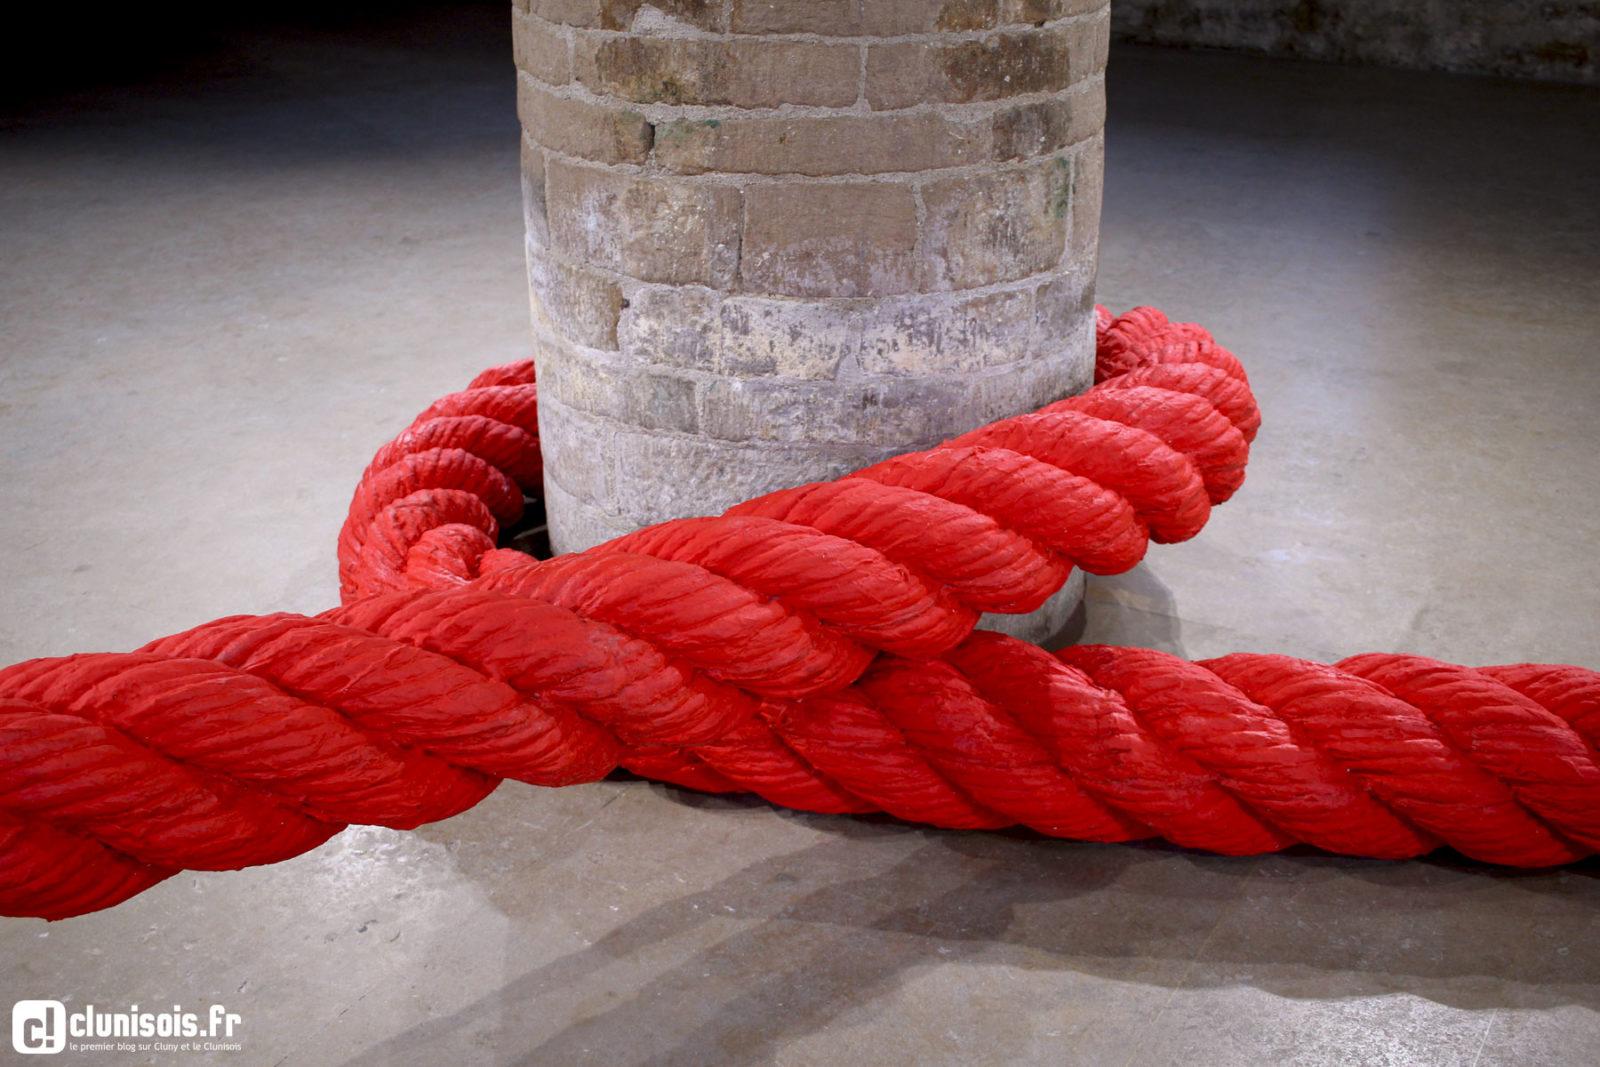 lilian bourgeat filet sculpture installation exposition corde noeuds7 - Lilian Bourgeat, le sculpteur qui voit grand